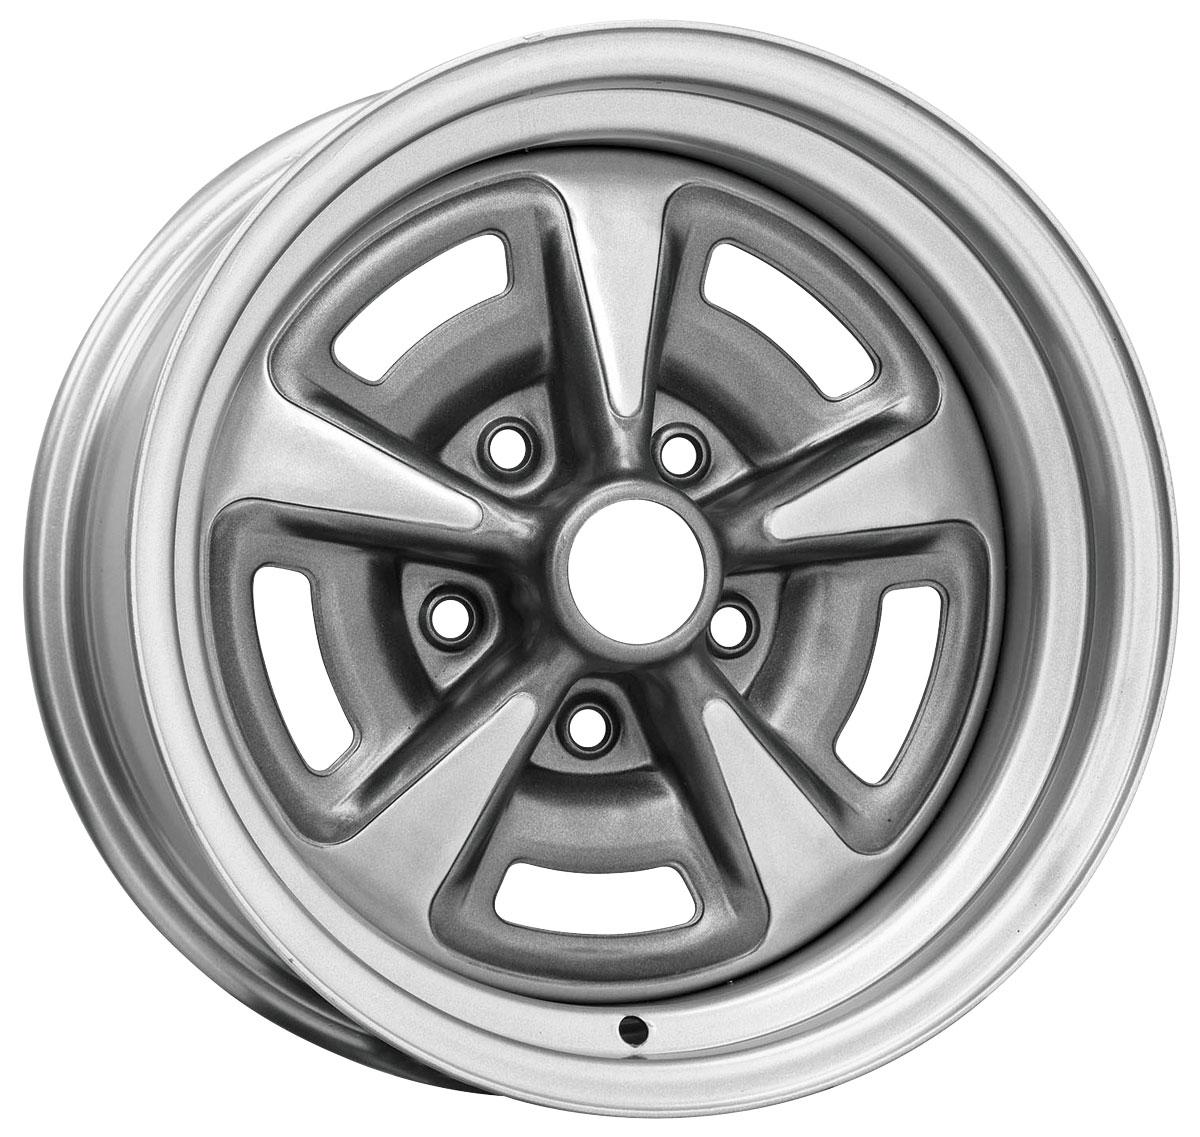 "Wheel, Pontiac Rally II, 15X8, 4-1/2"" Back Spacing"